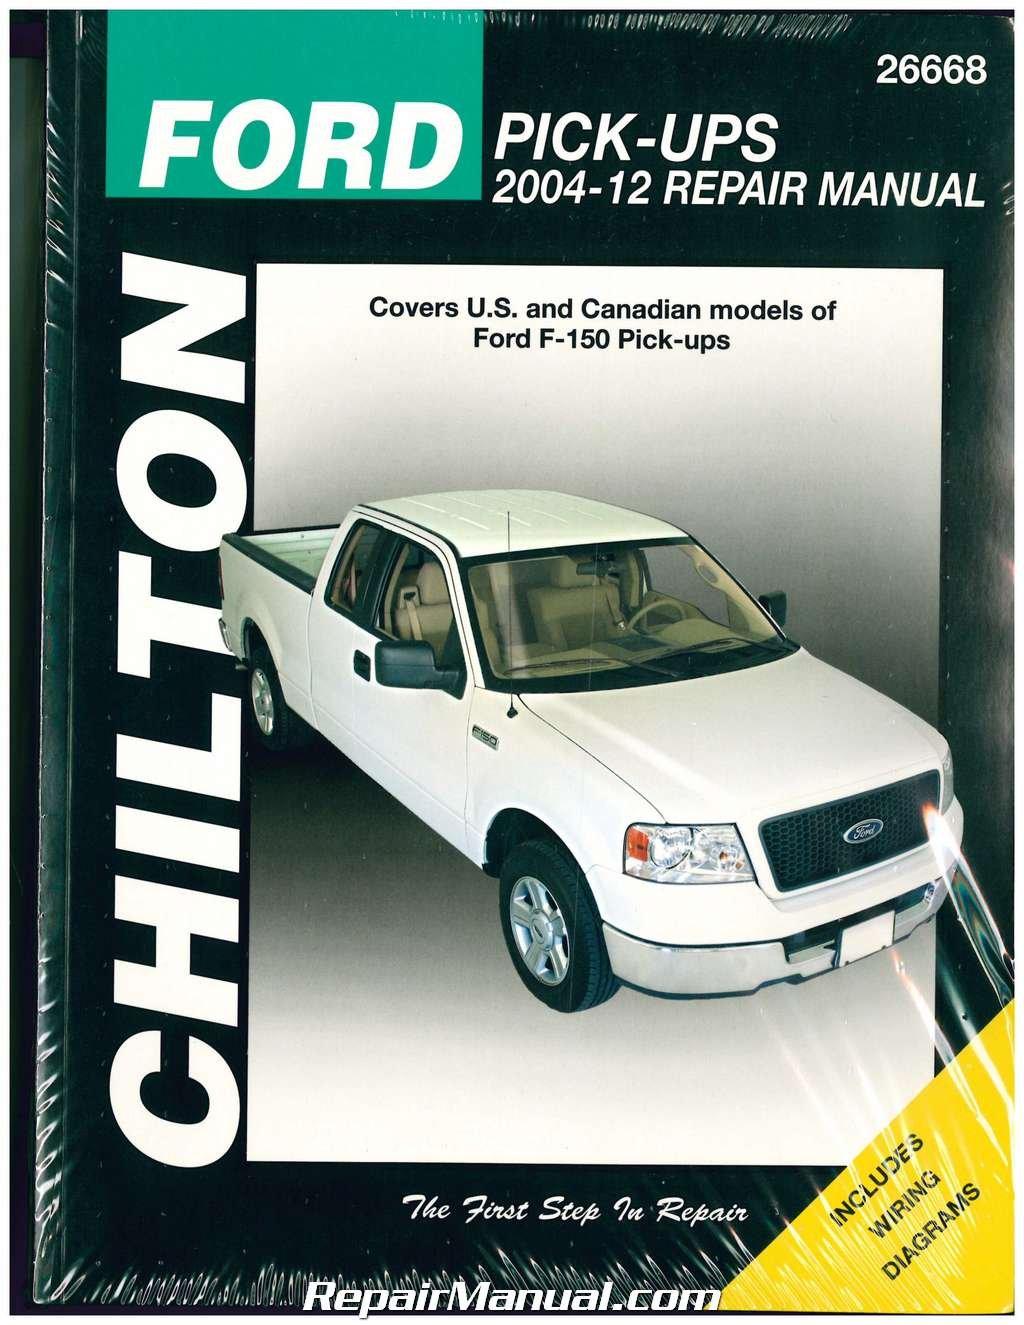 CH26668 Ford F-150 Repair Manual Pickup Trucks 2004-2012 Chilton:  Manufacturer: Amazon.com: Books